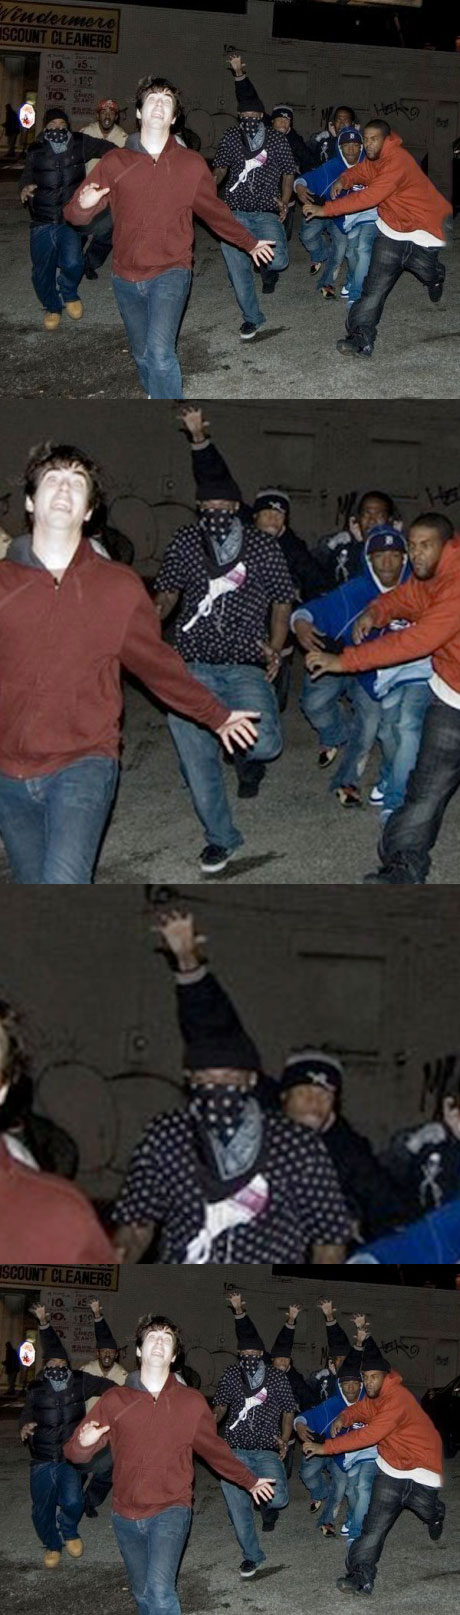 detroit, gang, white guy, chase, photoshop, wtf, arm